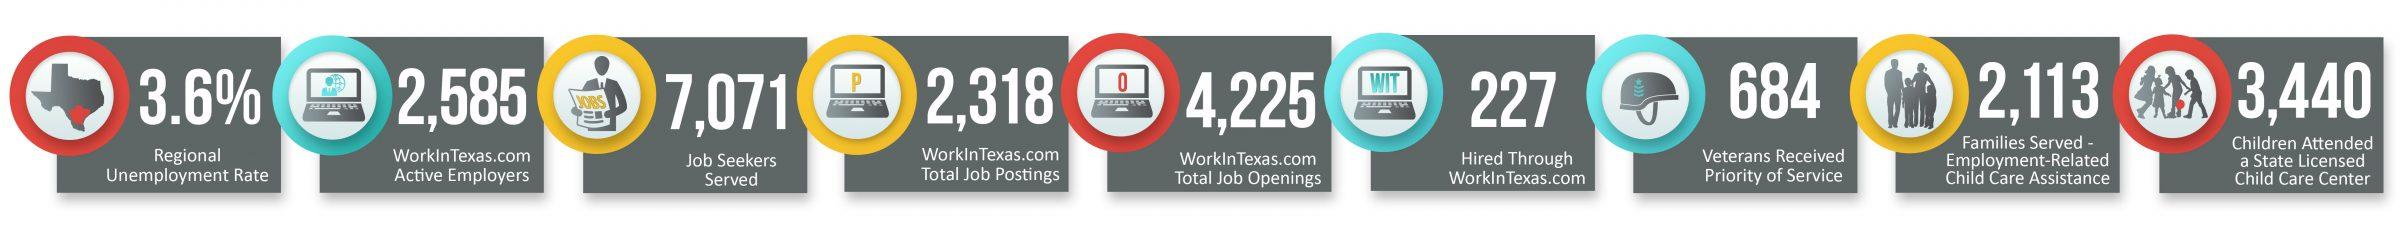 Workforce Snapshot June 2019